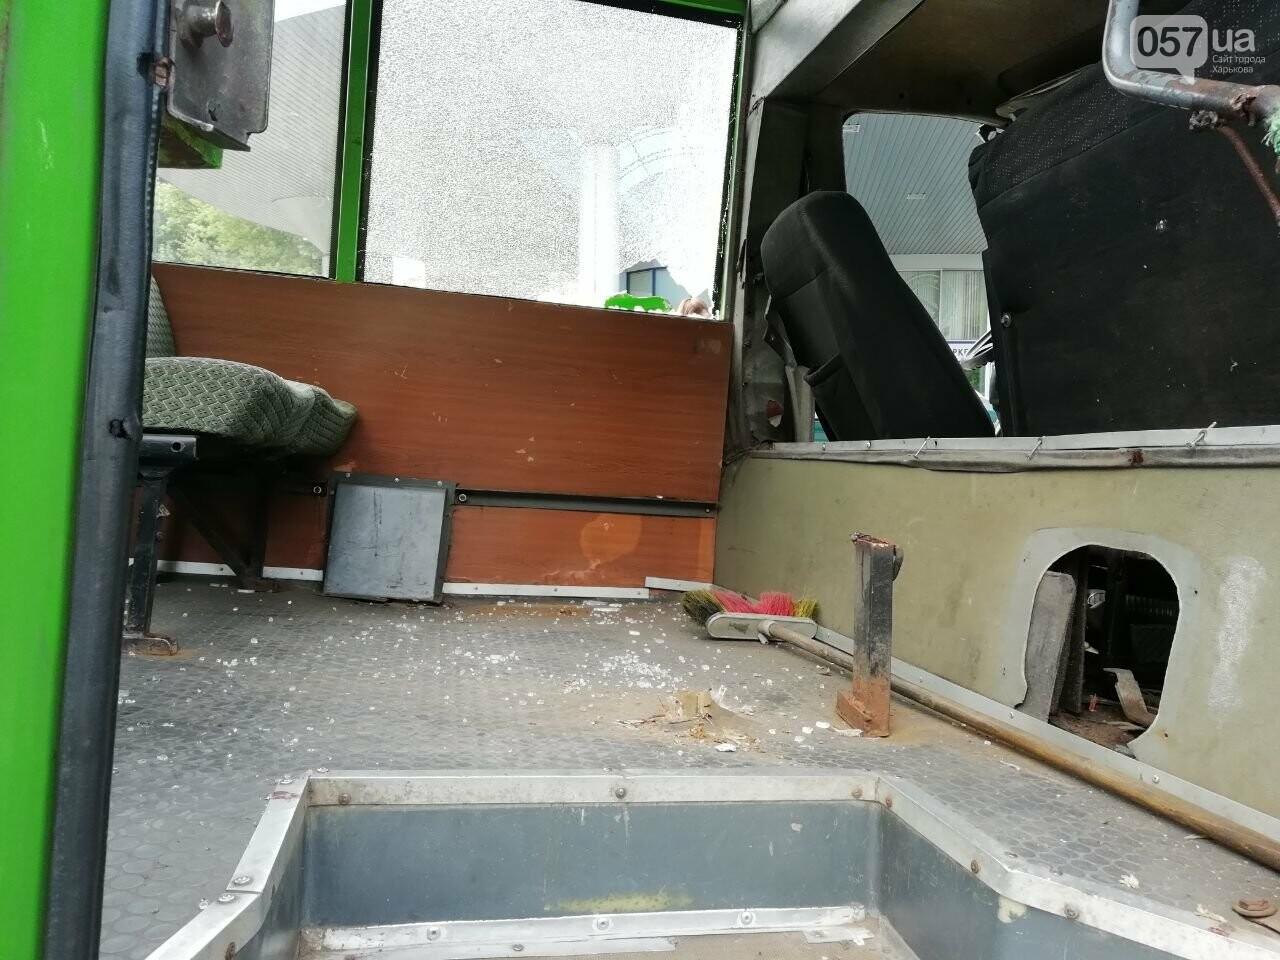 «Все сидели в крови»: подробности аварии на проспекте Тракторостроителей, - ФОТО, ВИДЕО, фото-8